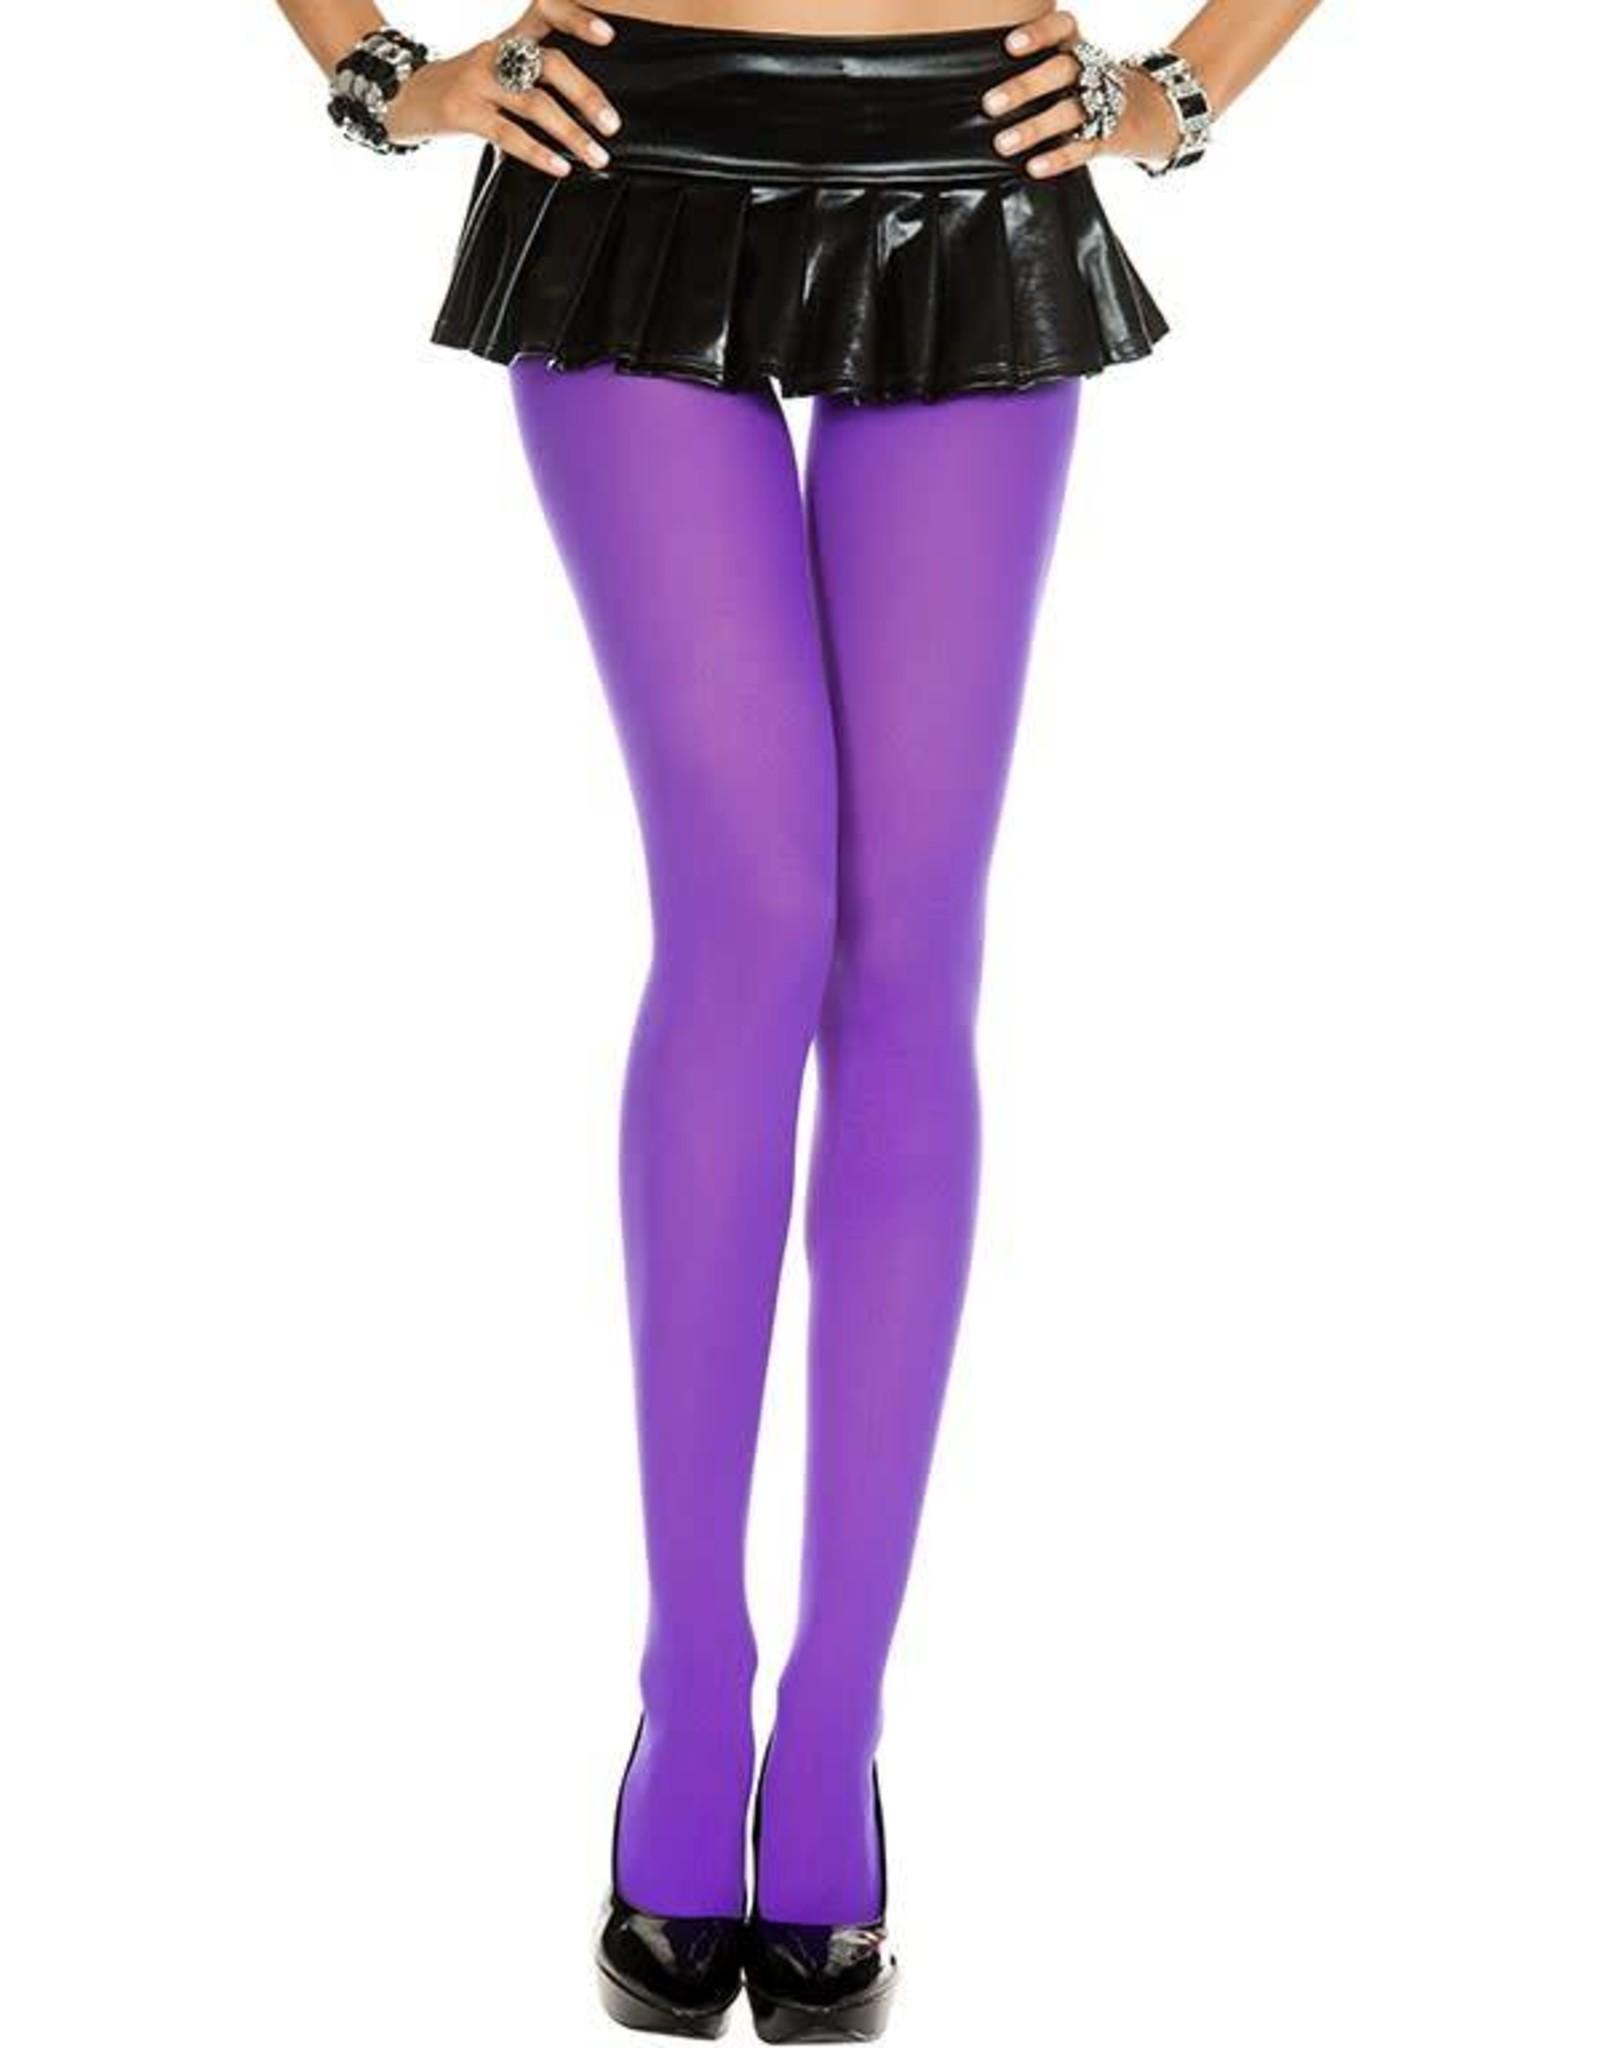 MUSIC LEGS - Purple Opaque Tights